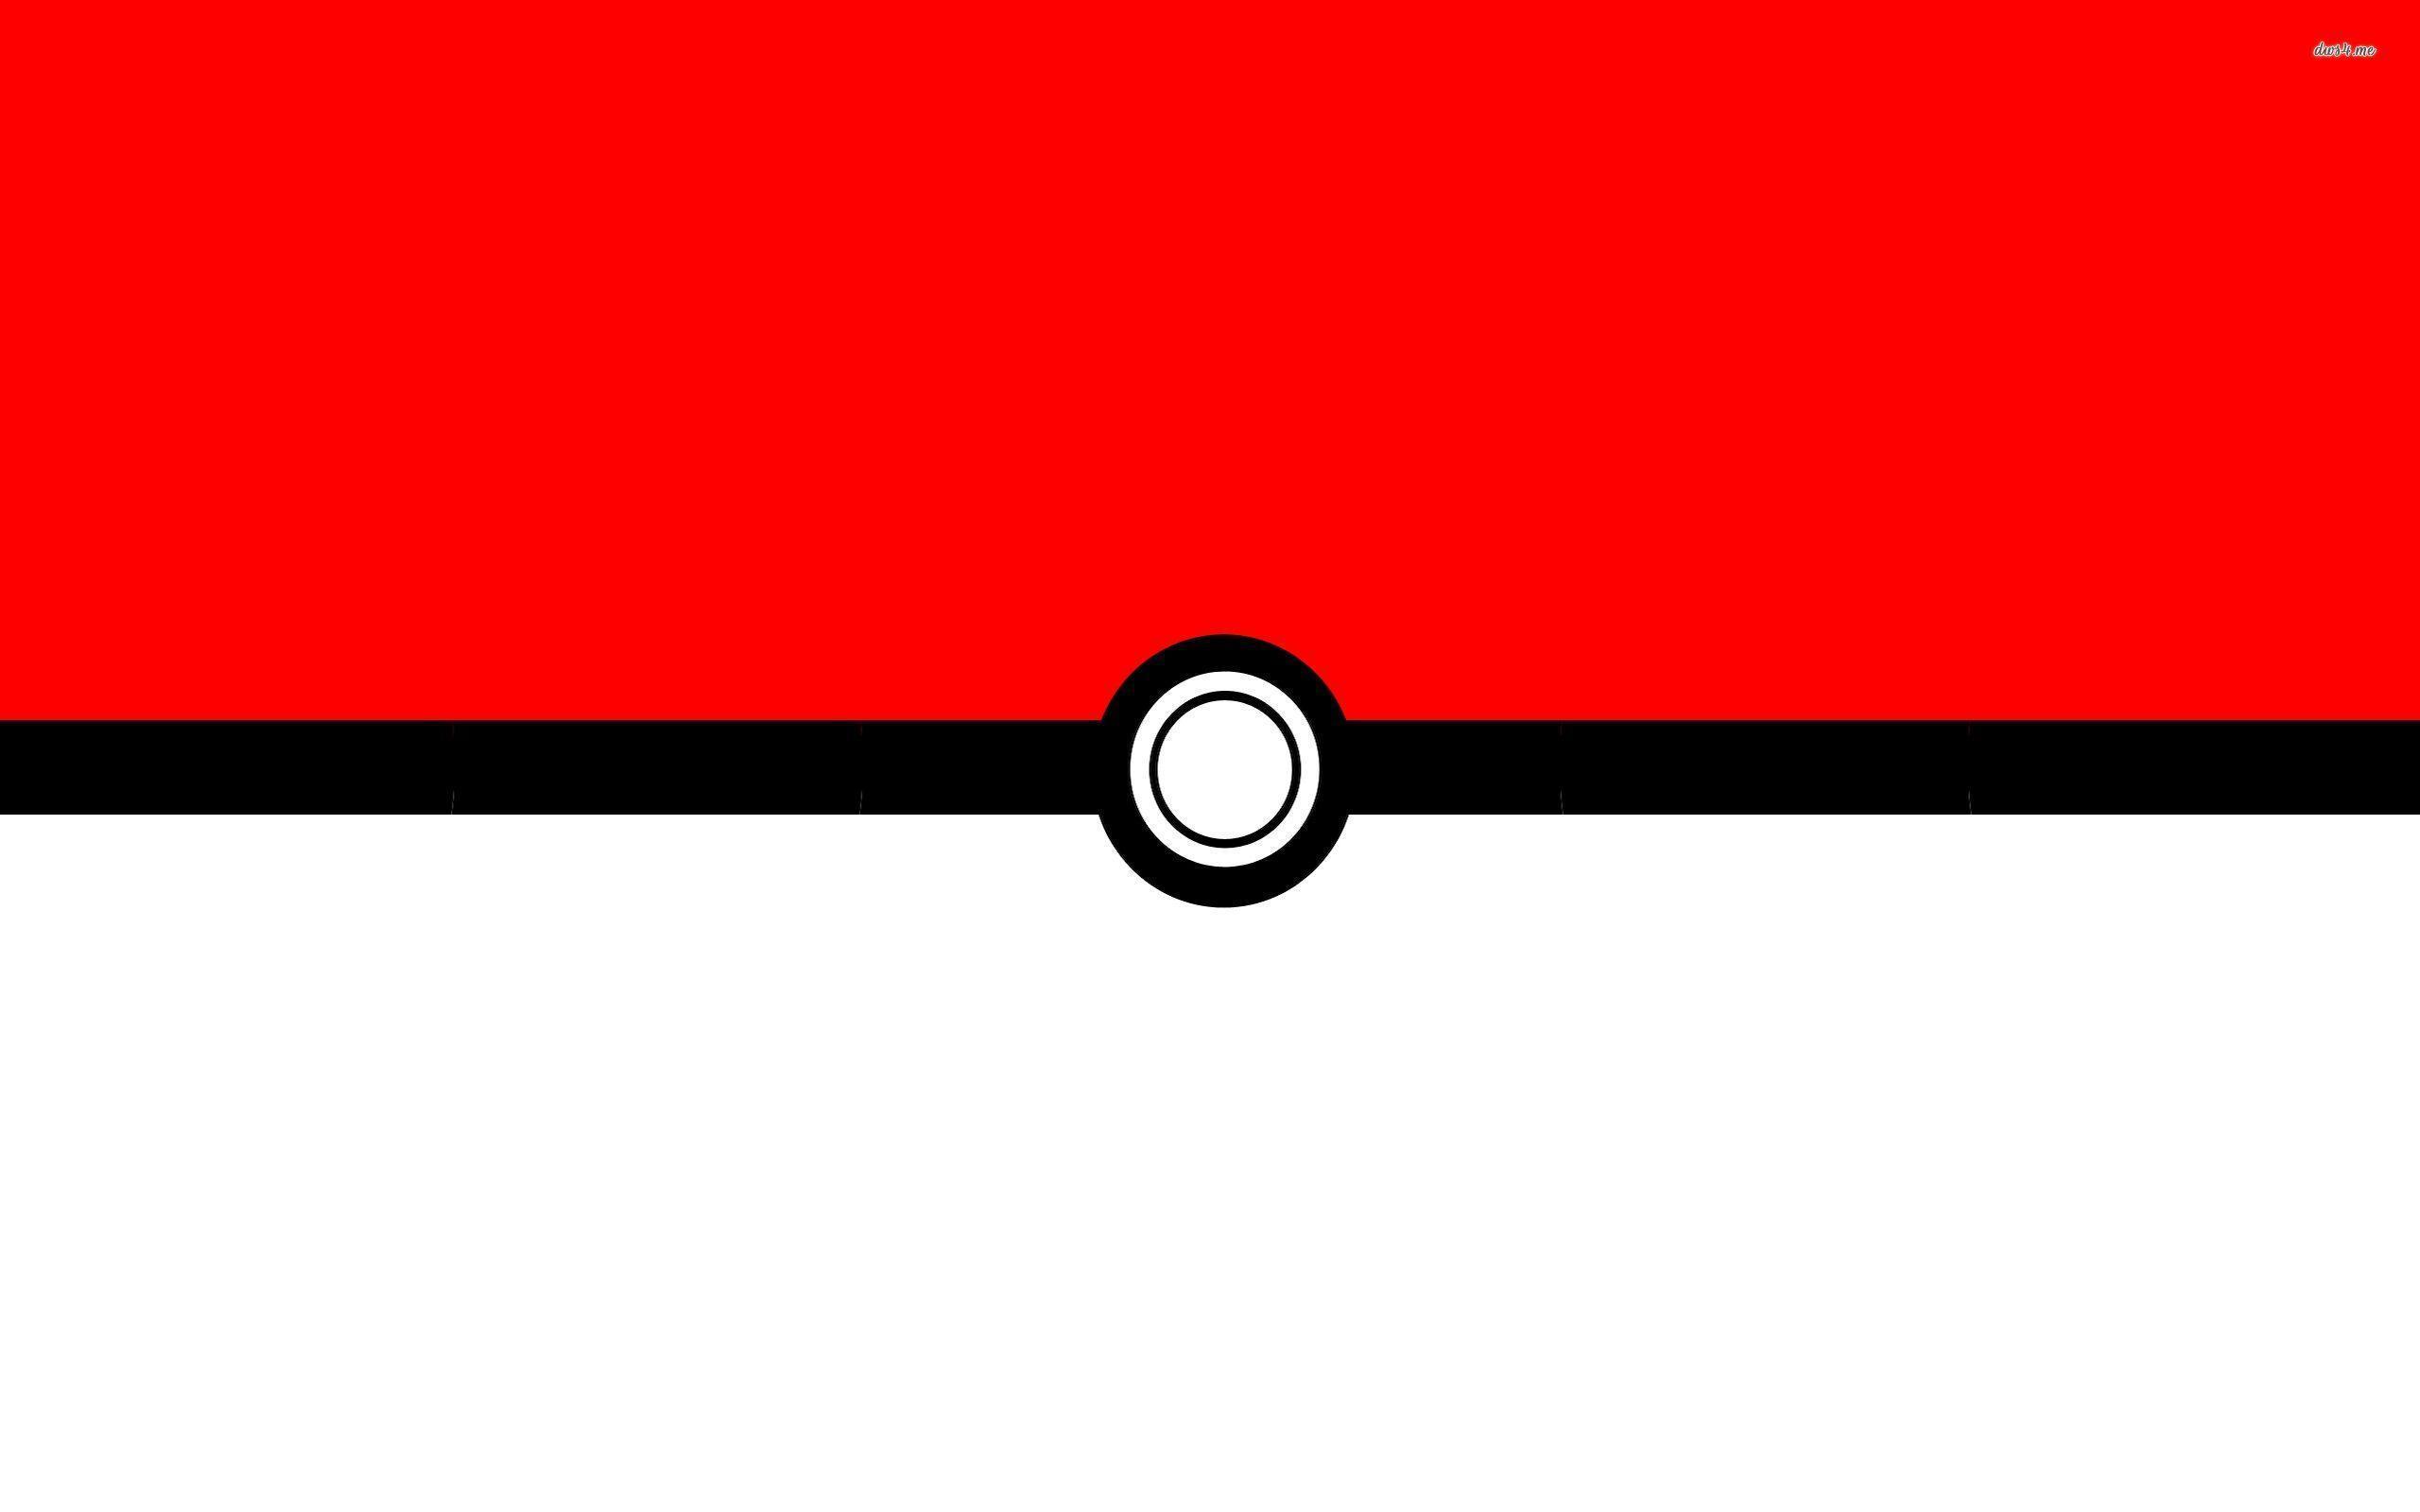 Pokemon Go Wallpaper | Wallpaper Photography HD